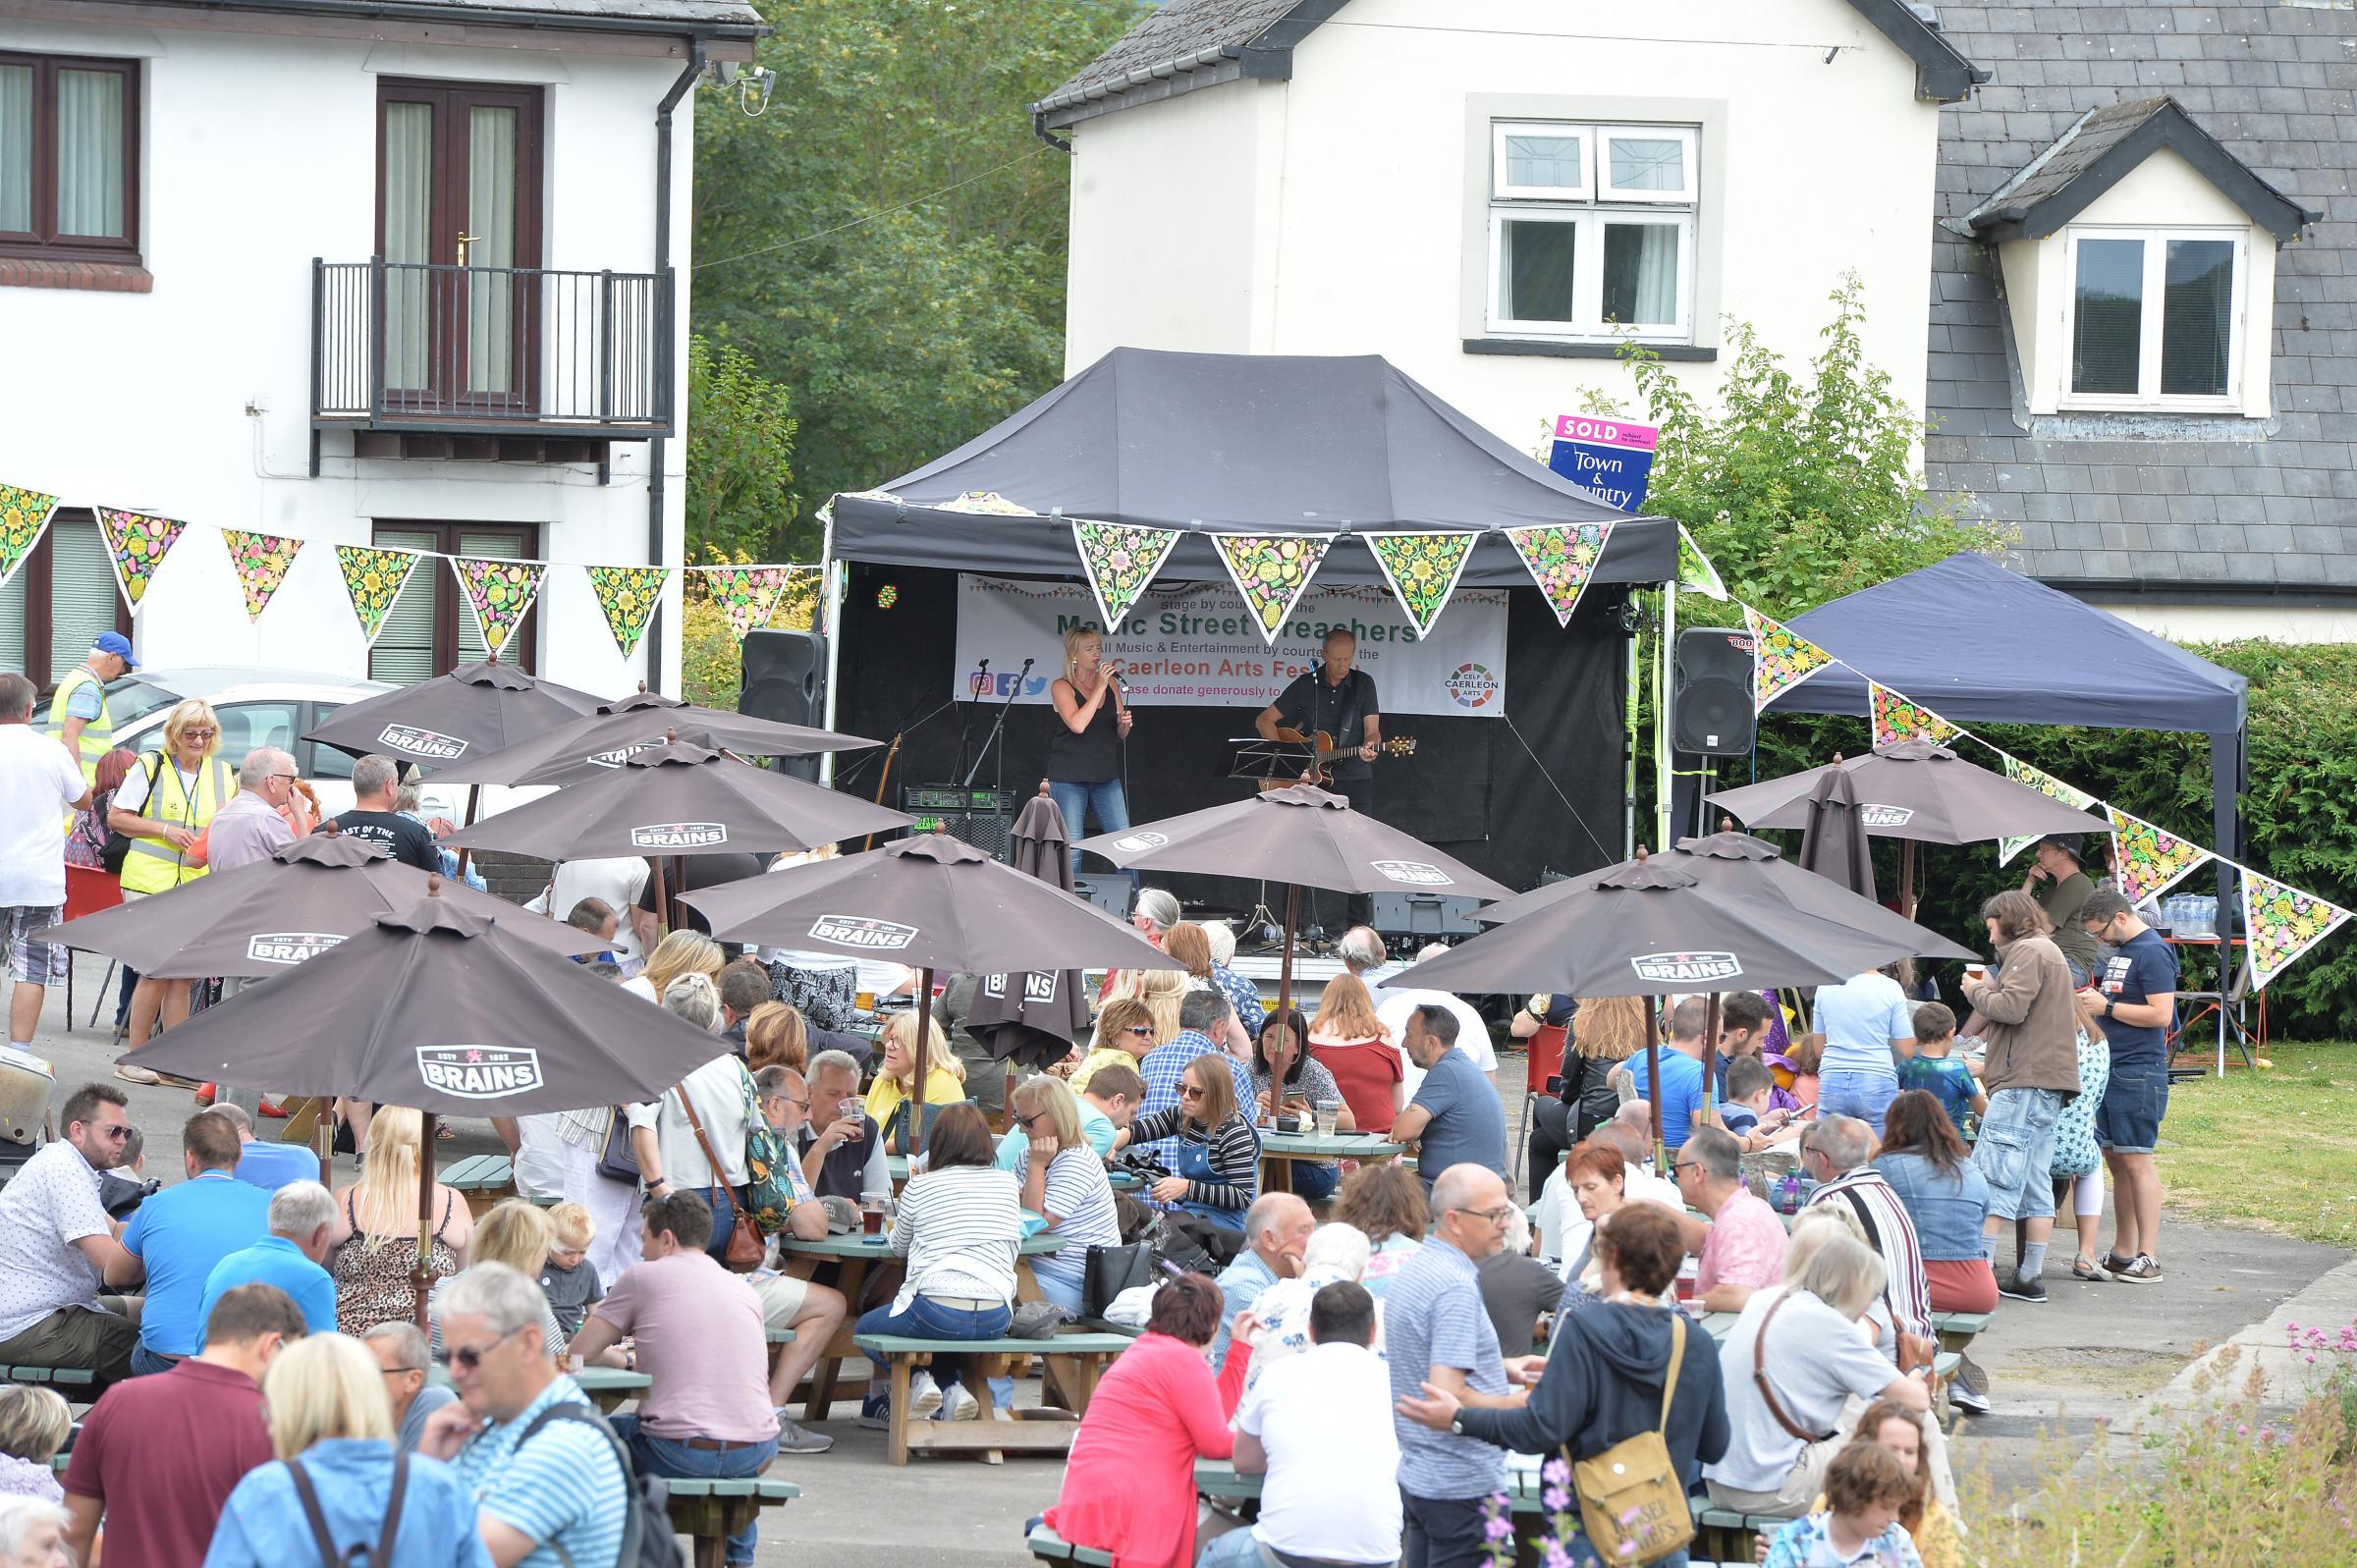 Impressive turnout for culmination of Caerleon festival